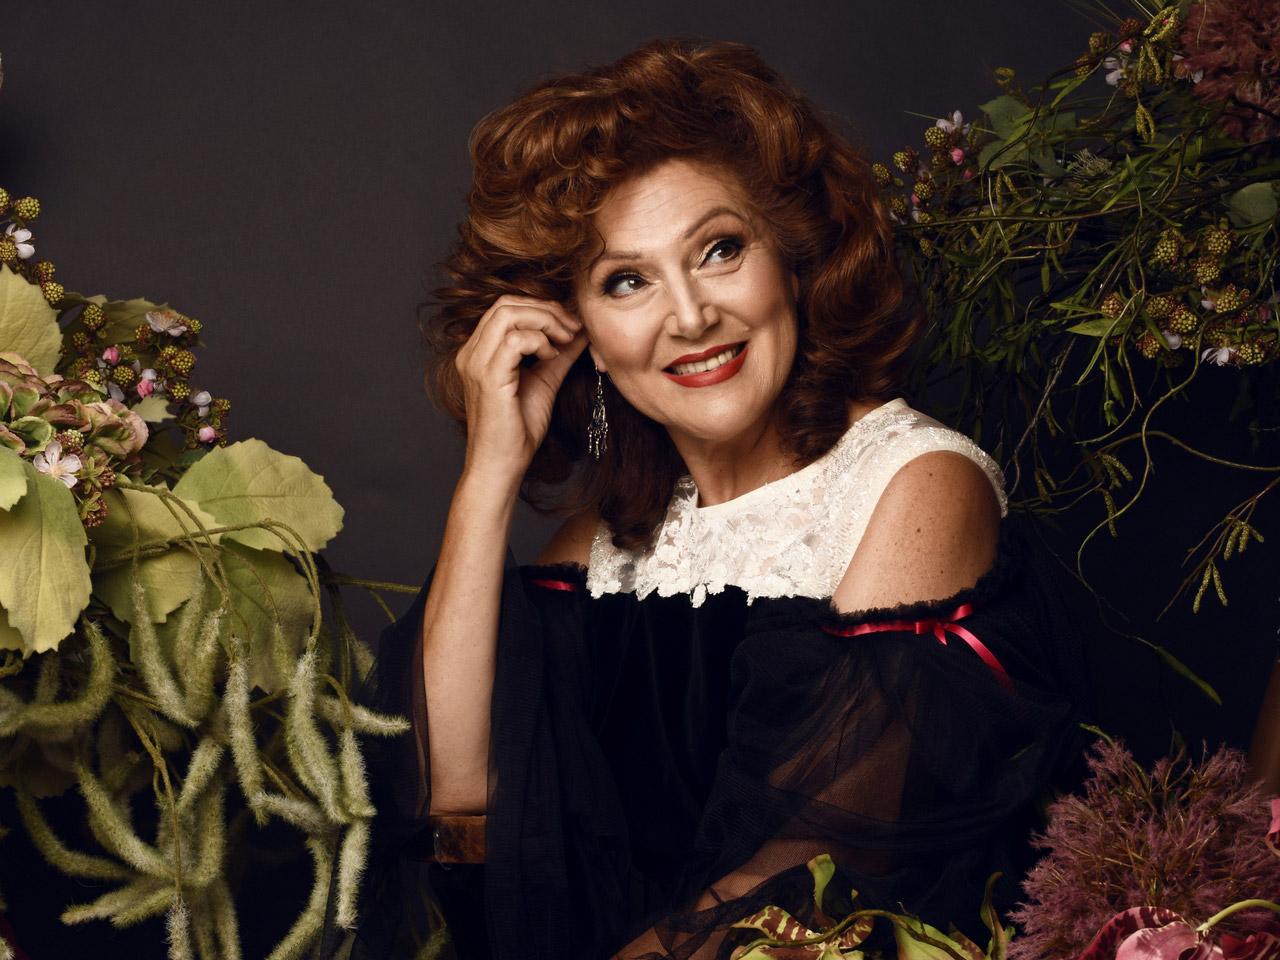 Miriam Gauci - Soprano, in custom Luke Azzopardi